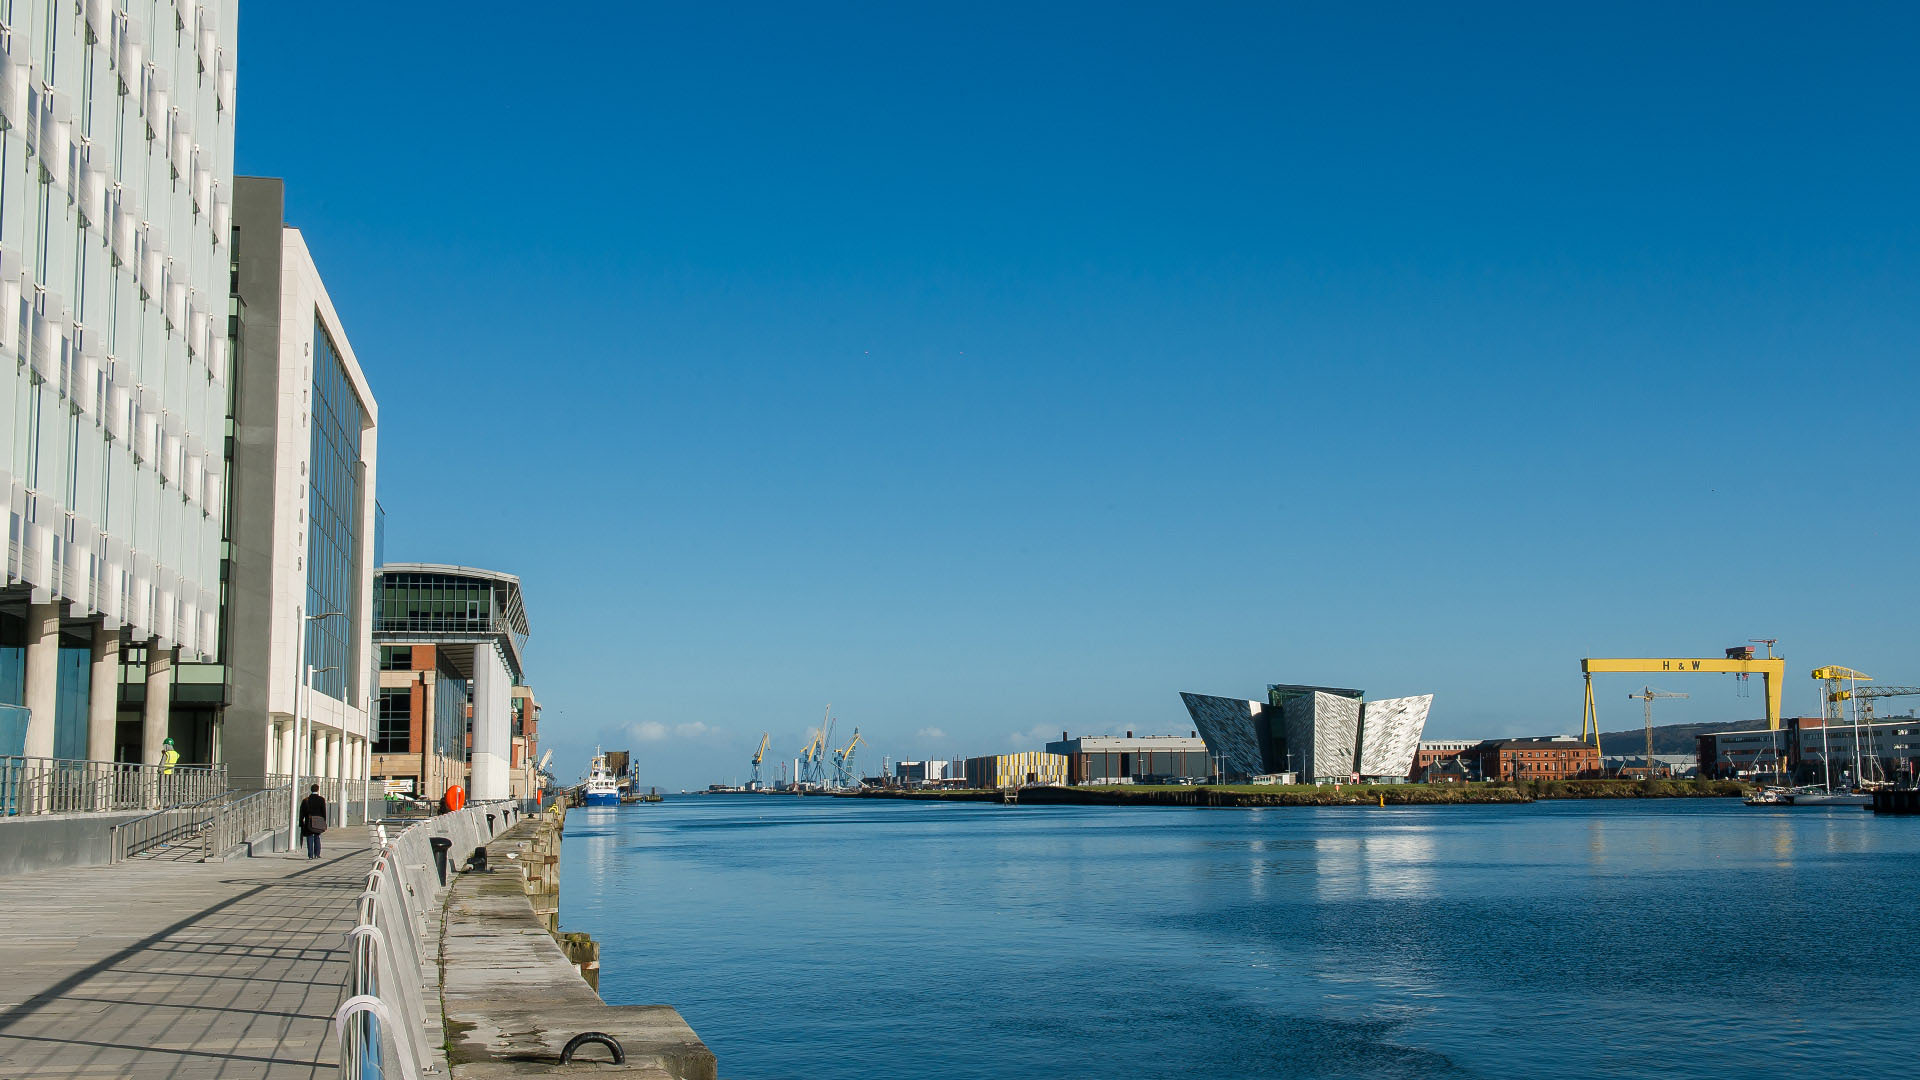 Maritime Mile - Neighbourhood - The Quays